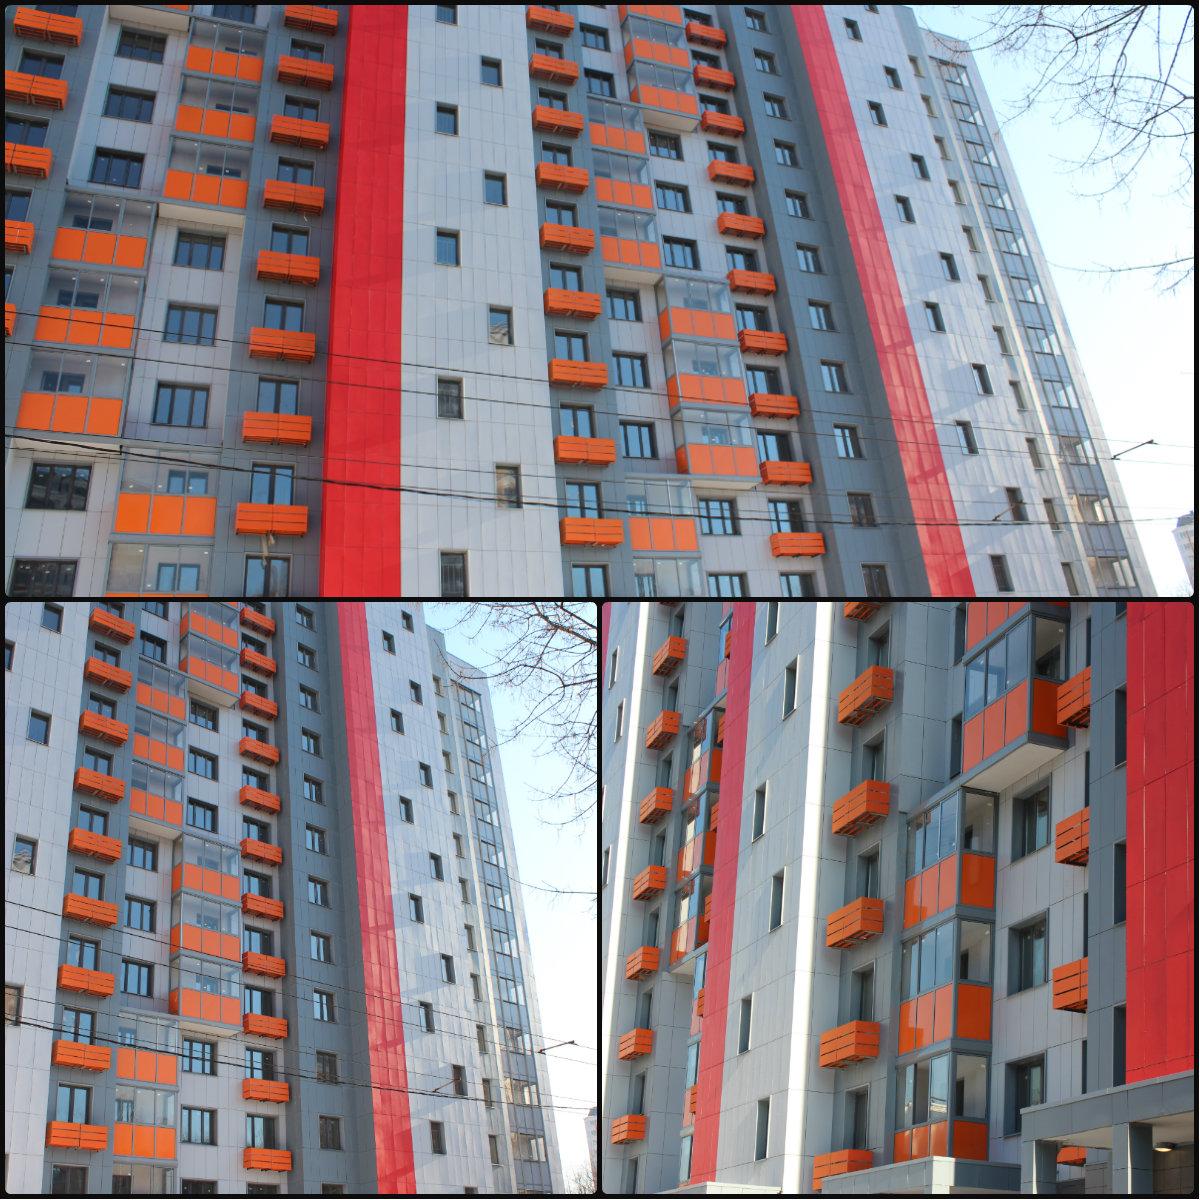 Отделка фасада жилого дома фасадными панелями г. Москва